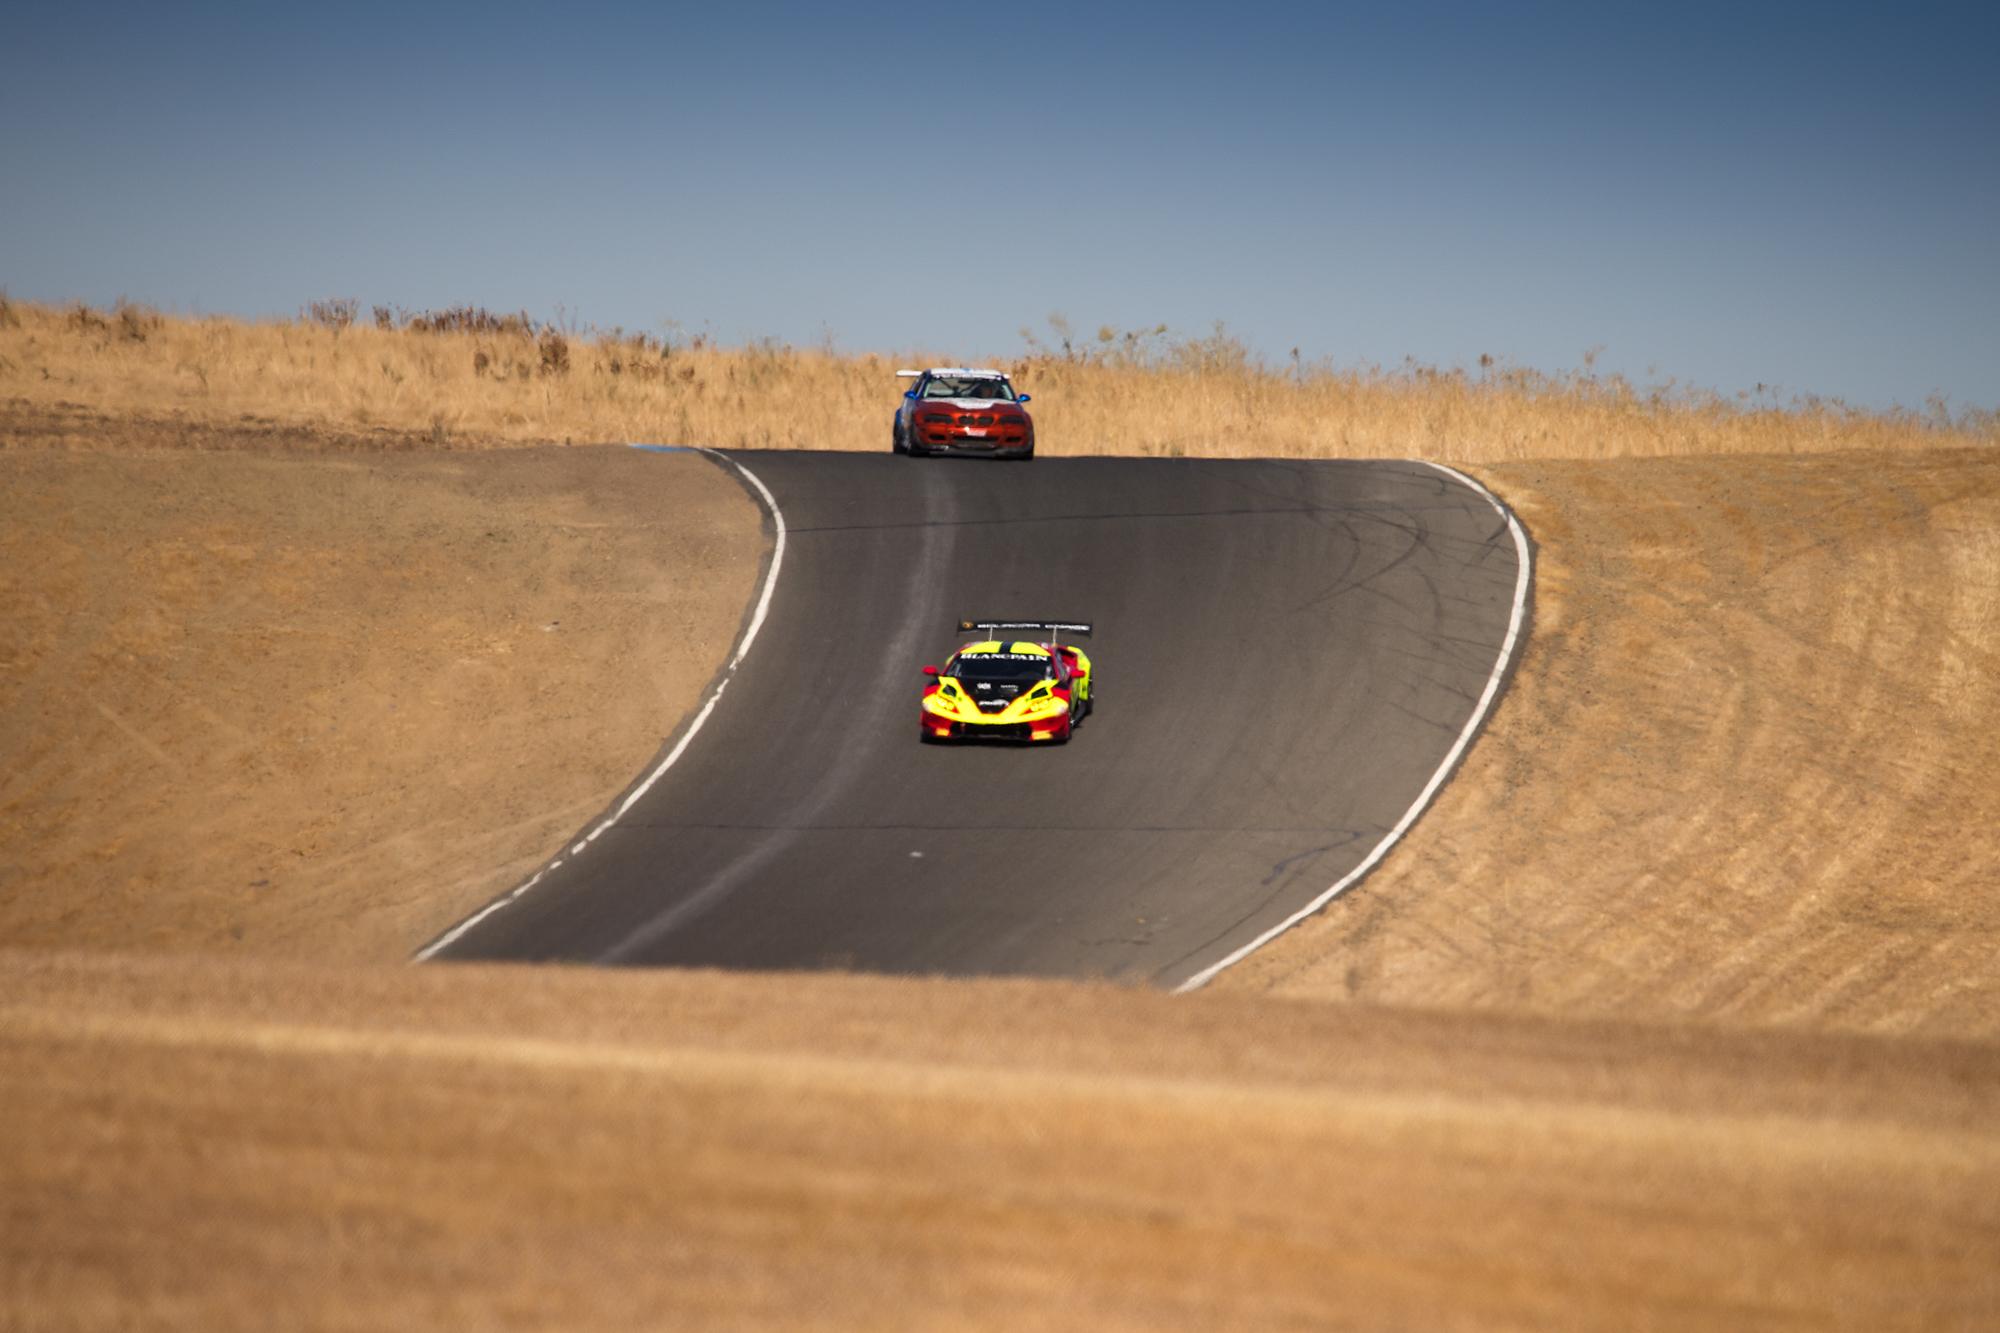 Steven-Racing-20171007-45285.jpg